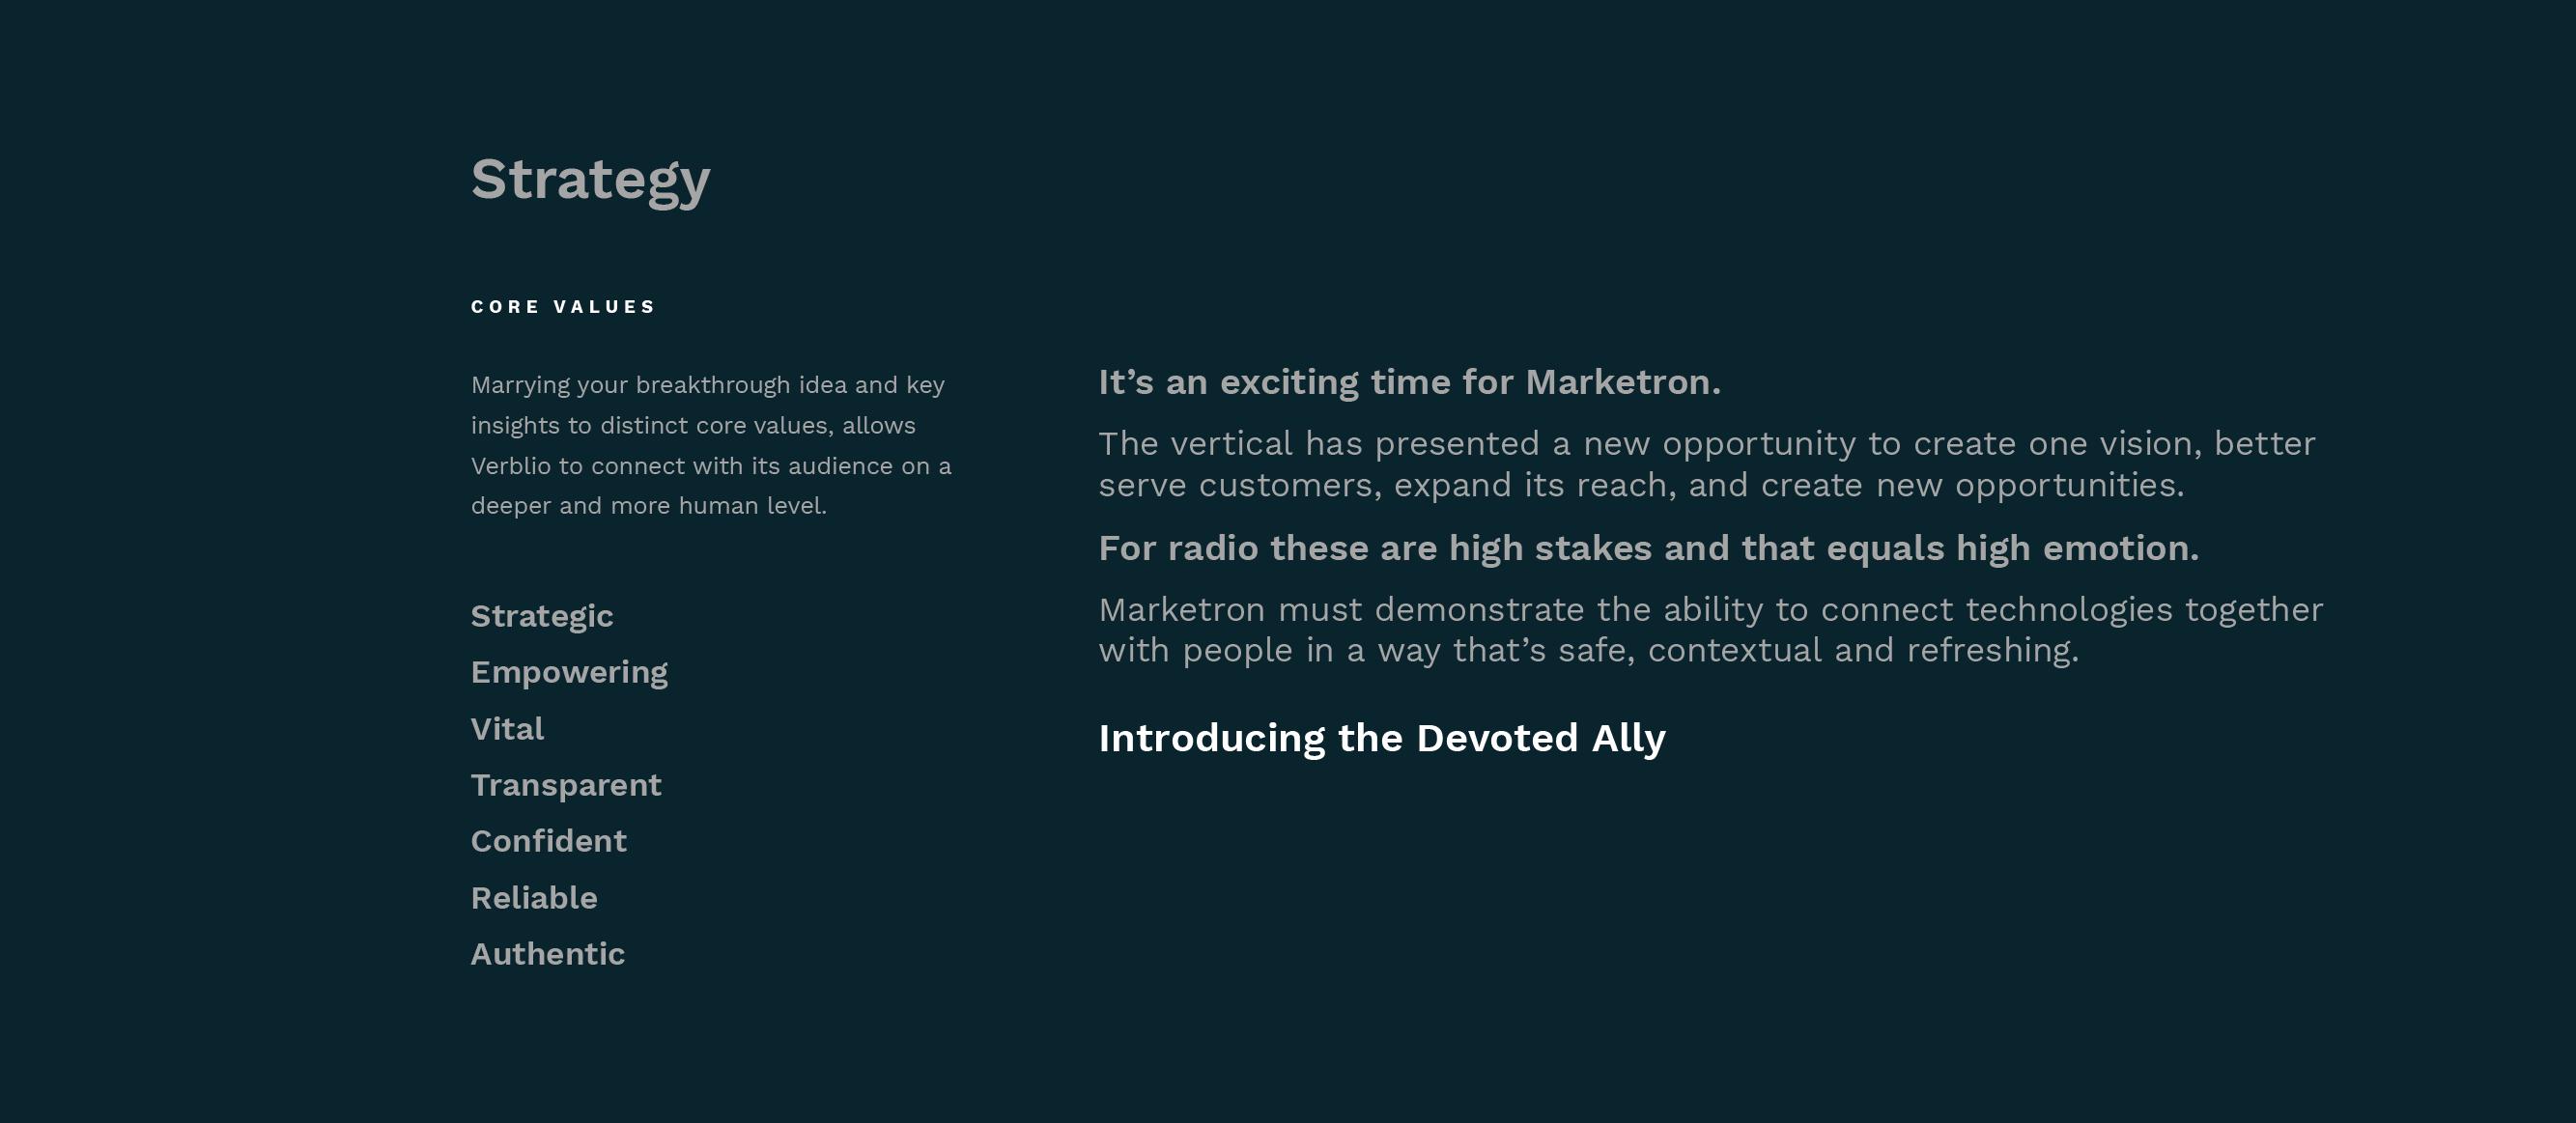 marketron-brand-strategy-04